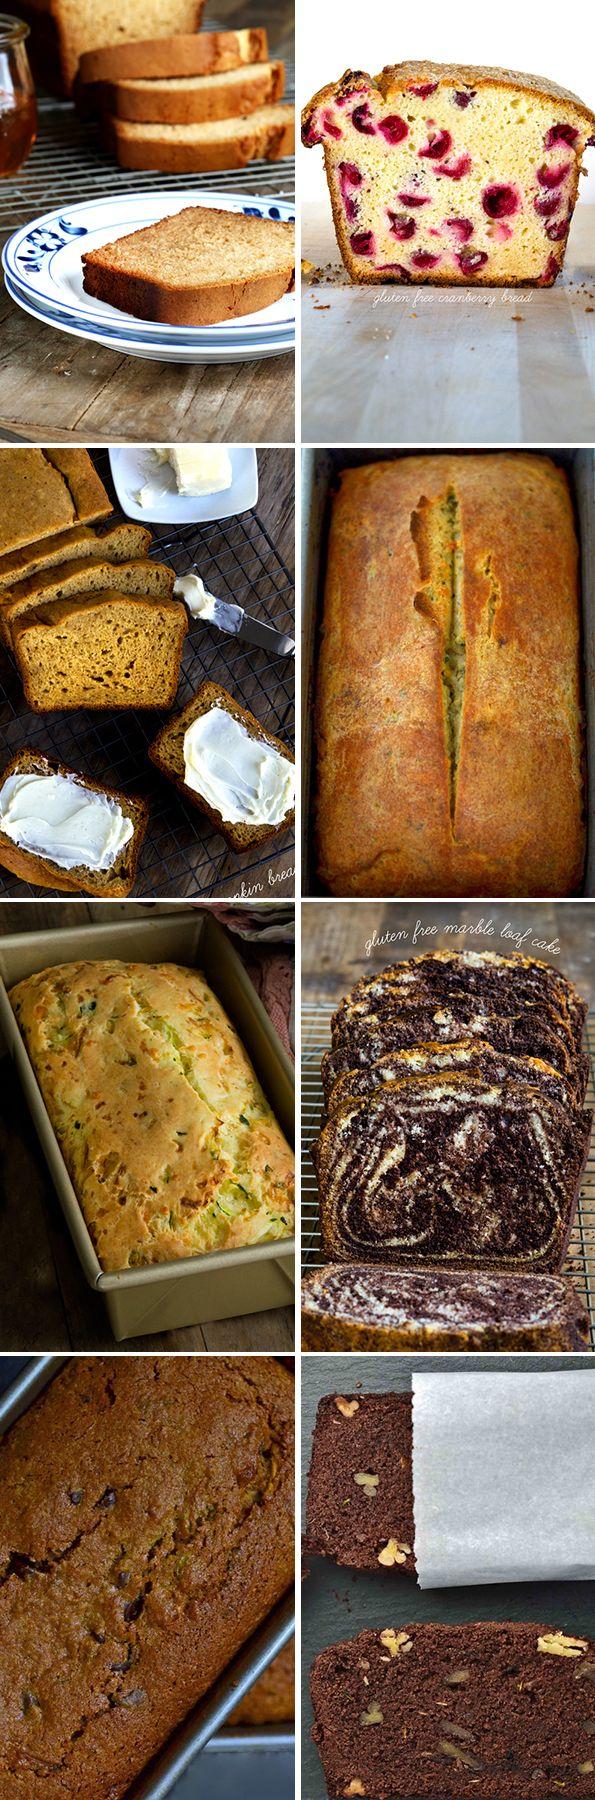 13 Gluten Free Quick Bread Recipes Great Gluten Free Recipes For Every Occasion Gluten Free Quick Bread Gluten Free Quick Bread Recipes Gluten Free Sweet